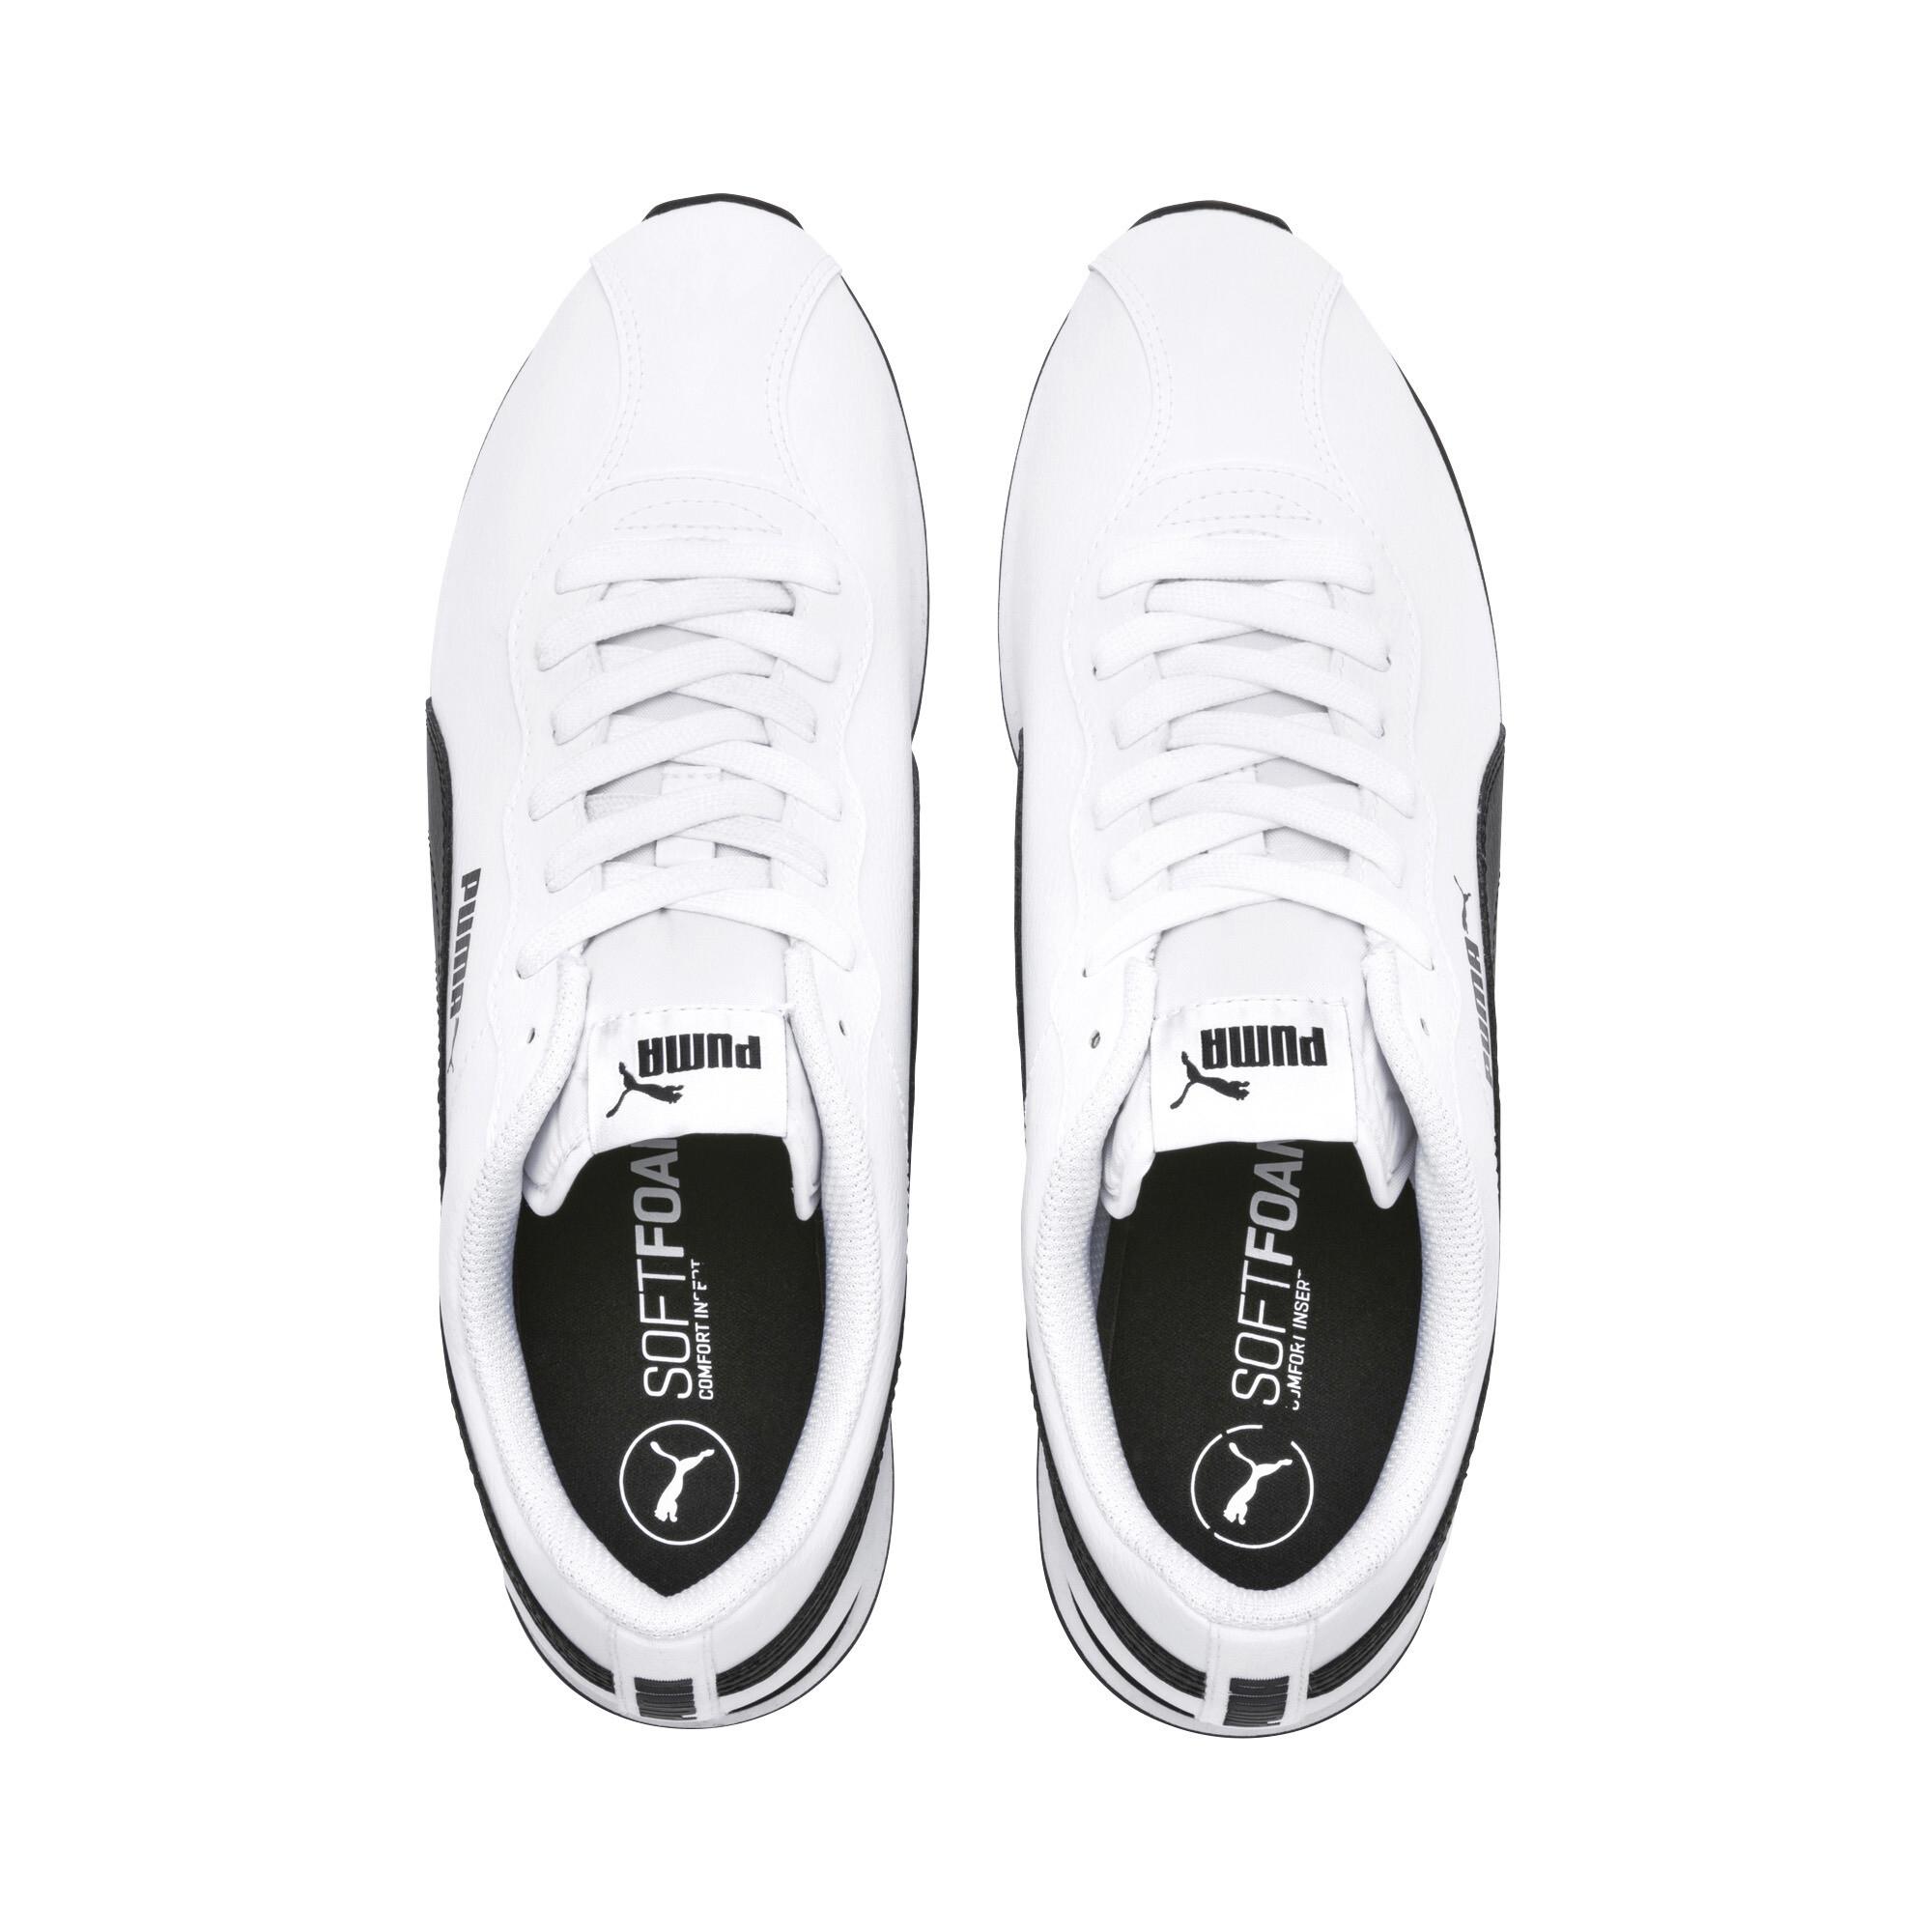 PUMA-Men-039-s-Turin-II-Sneakers thumbnail 19